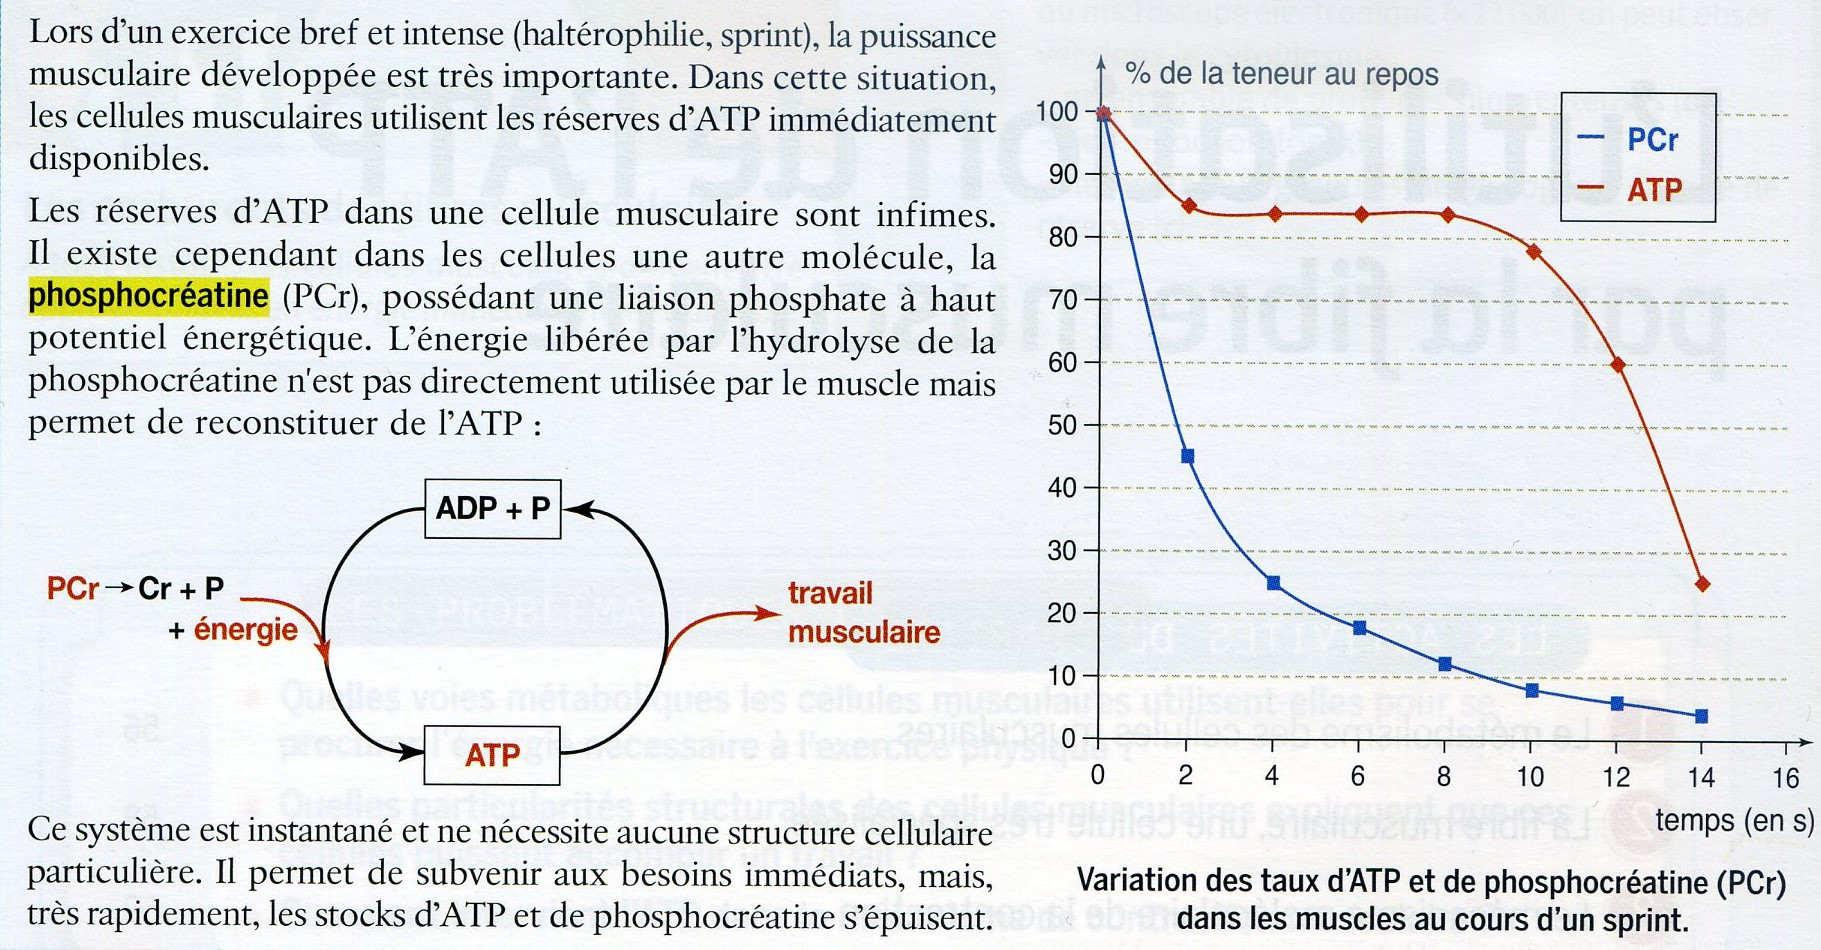 Phosphocréatine et ATP